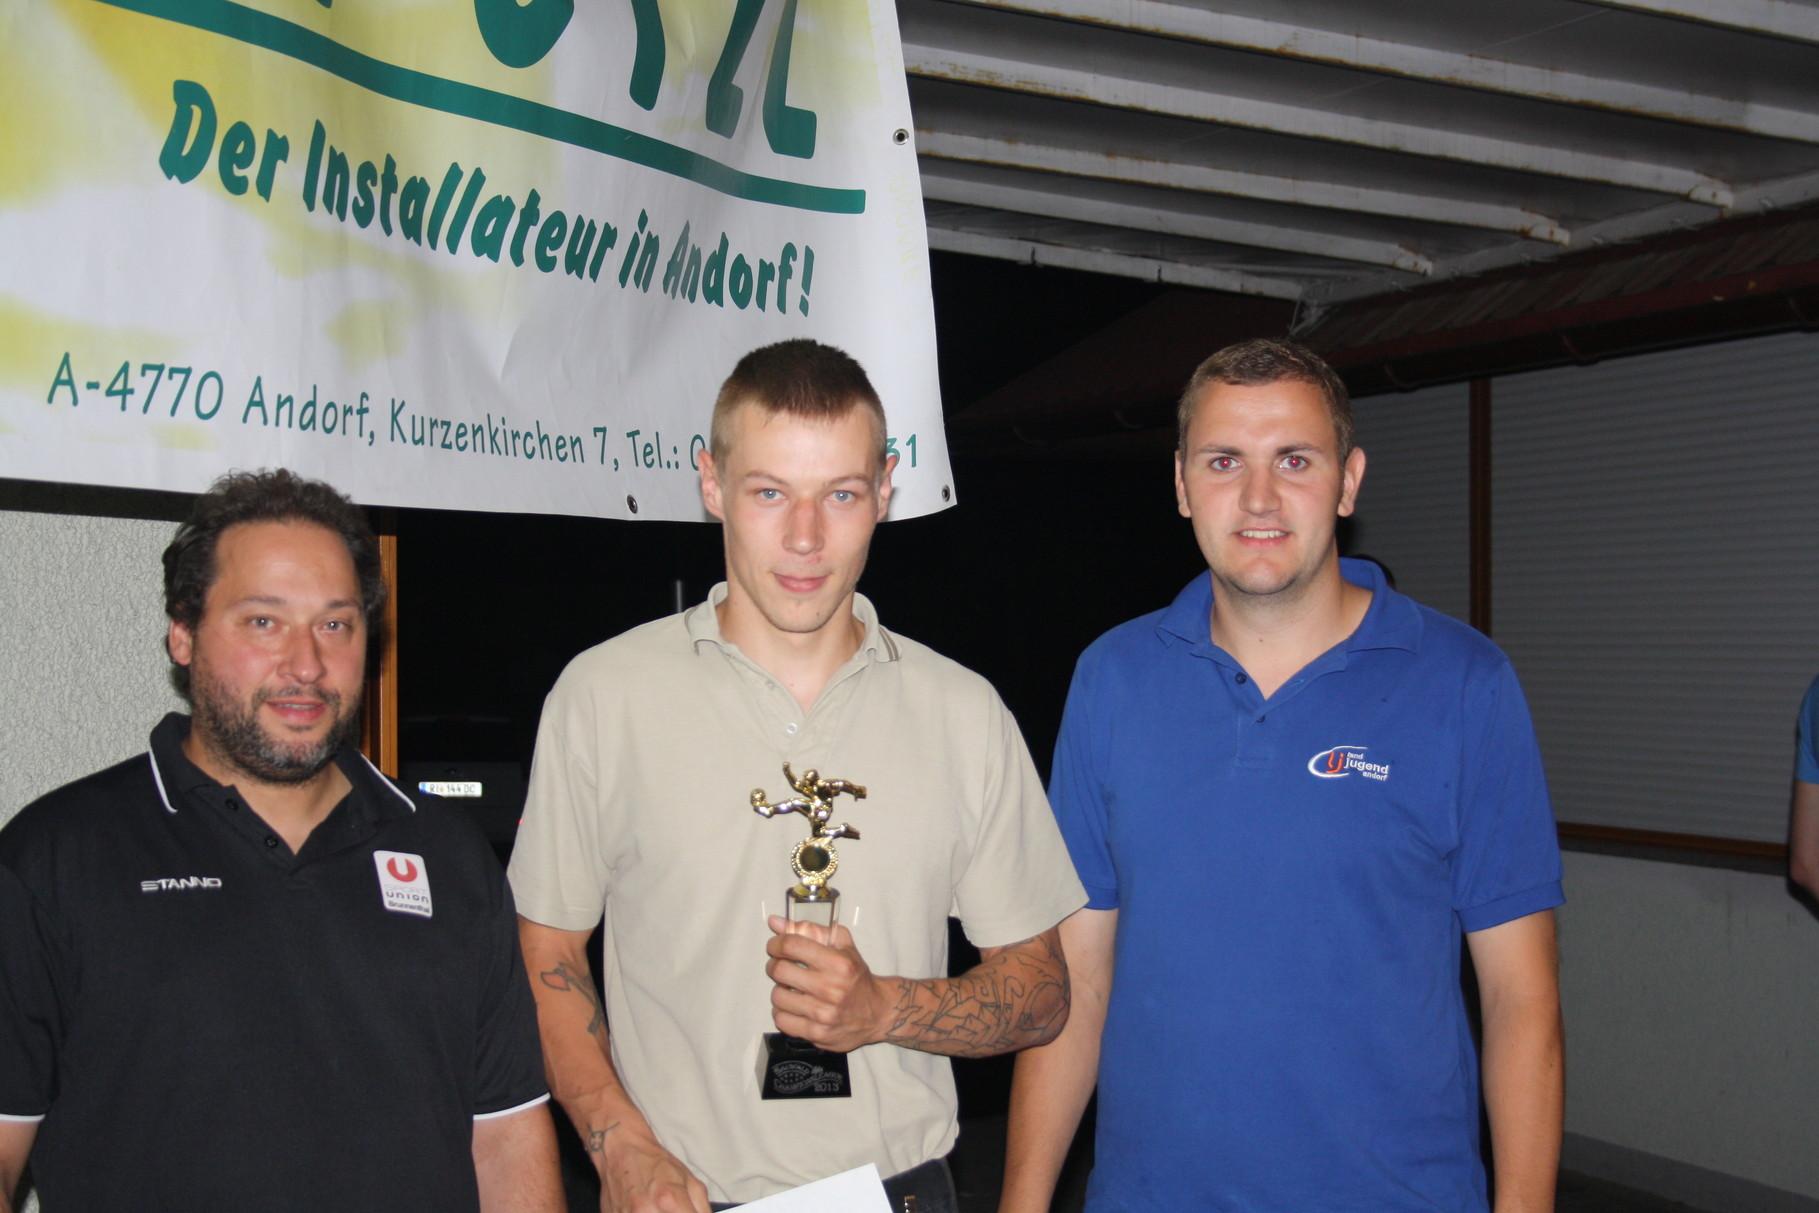 Torschützenkönig 2013 - Ortbauer David